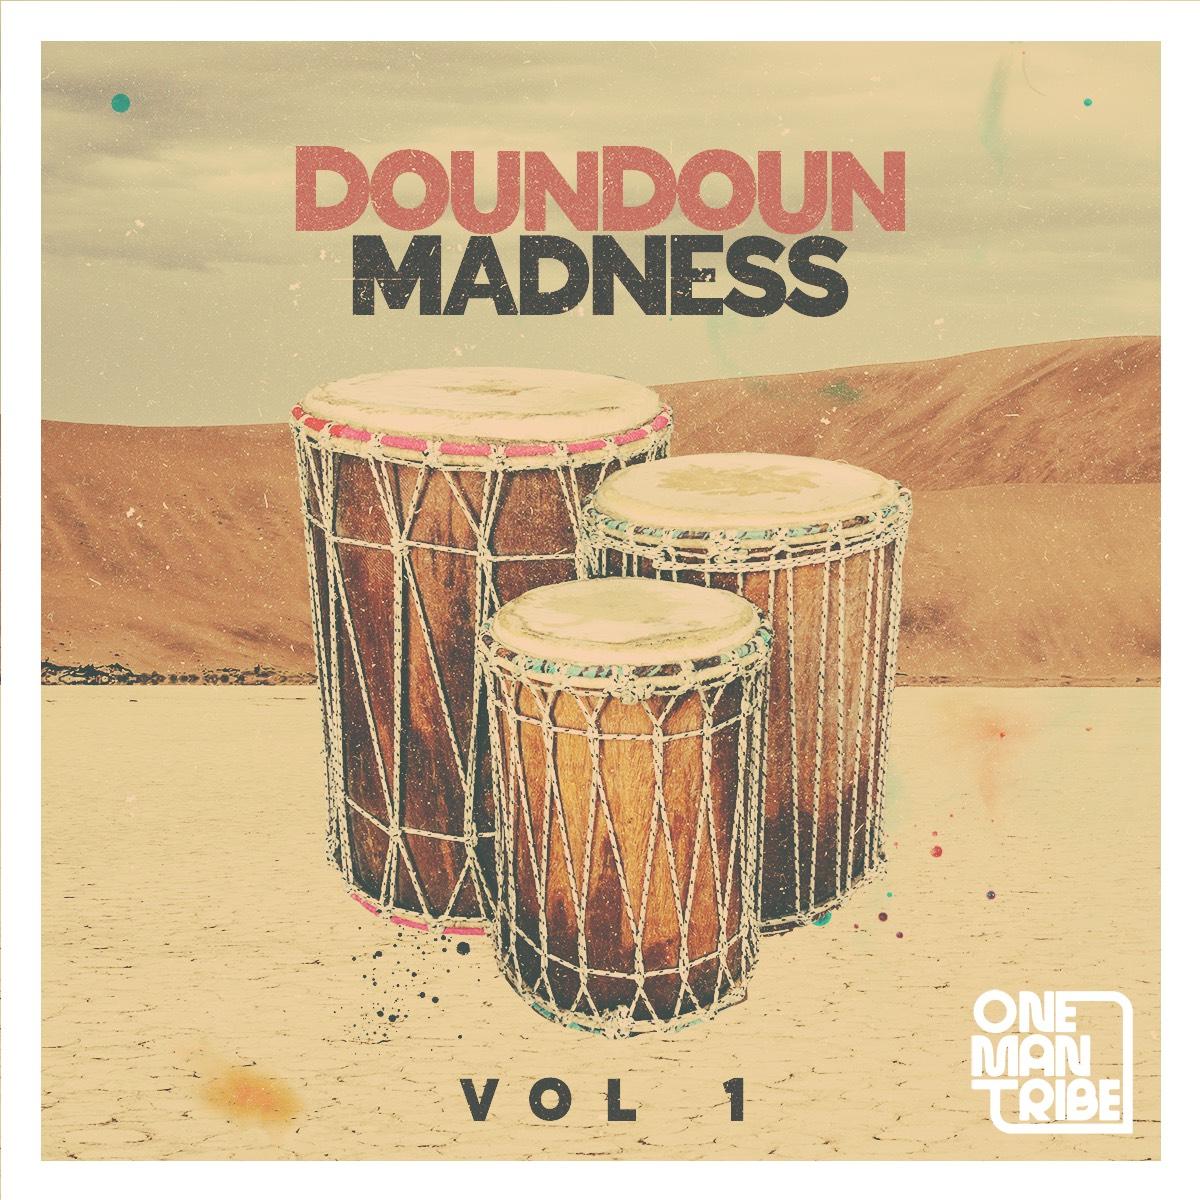 Doundoun Madness Vol. 1